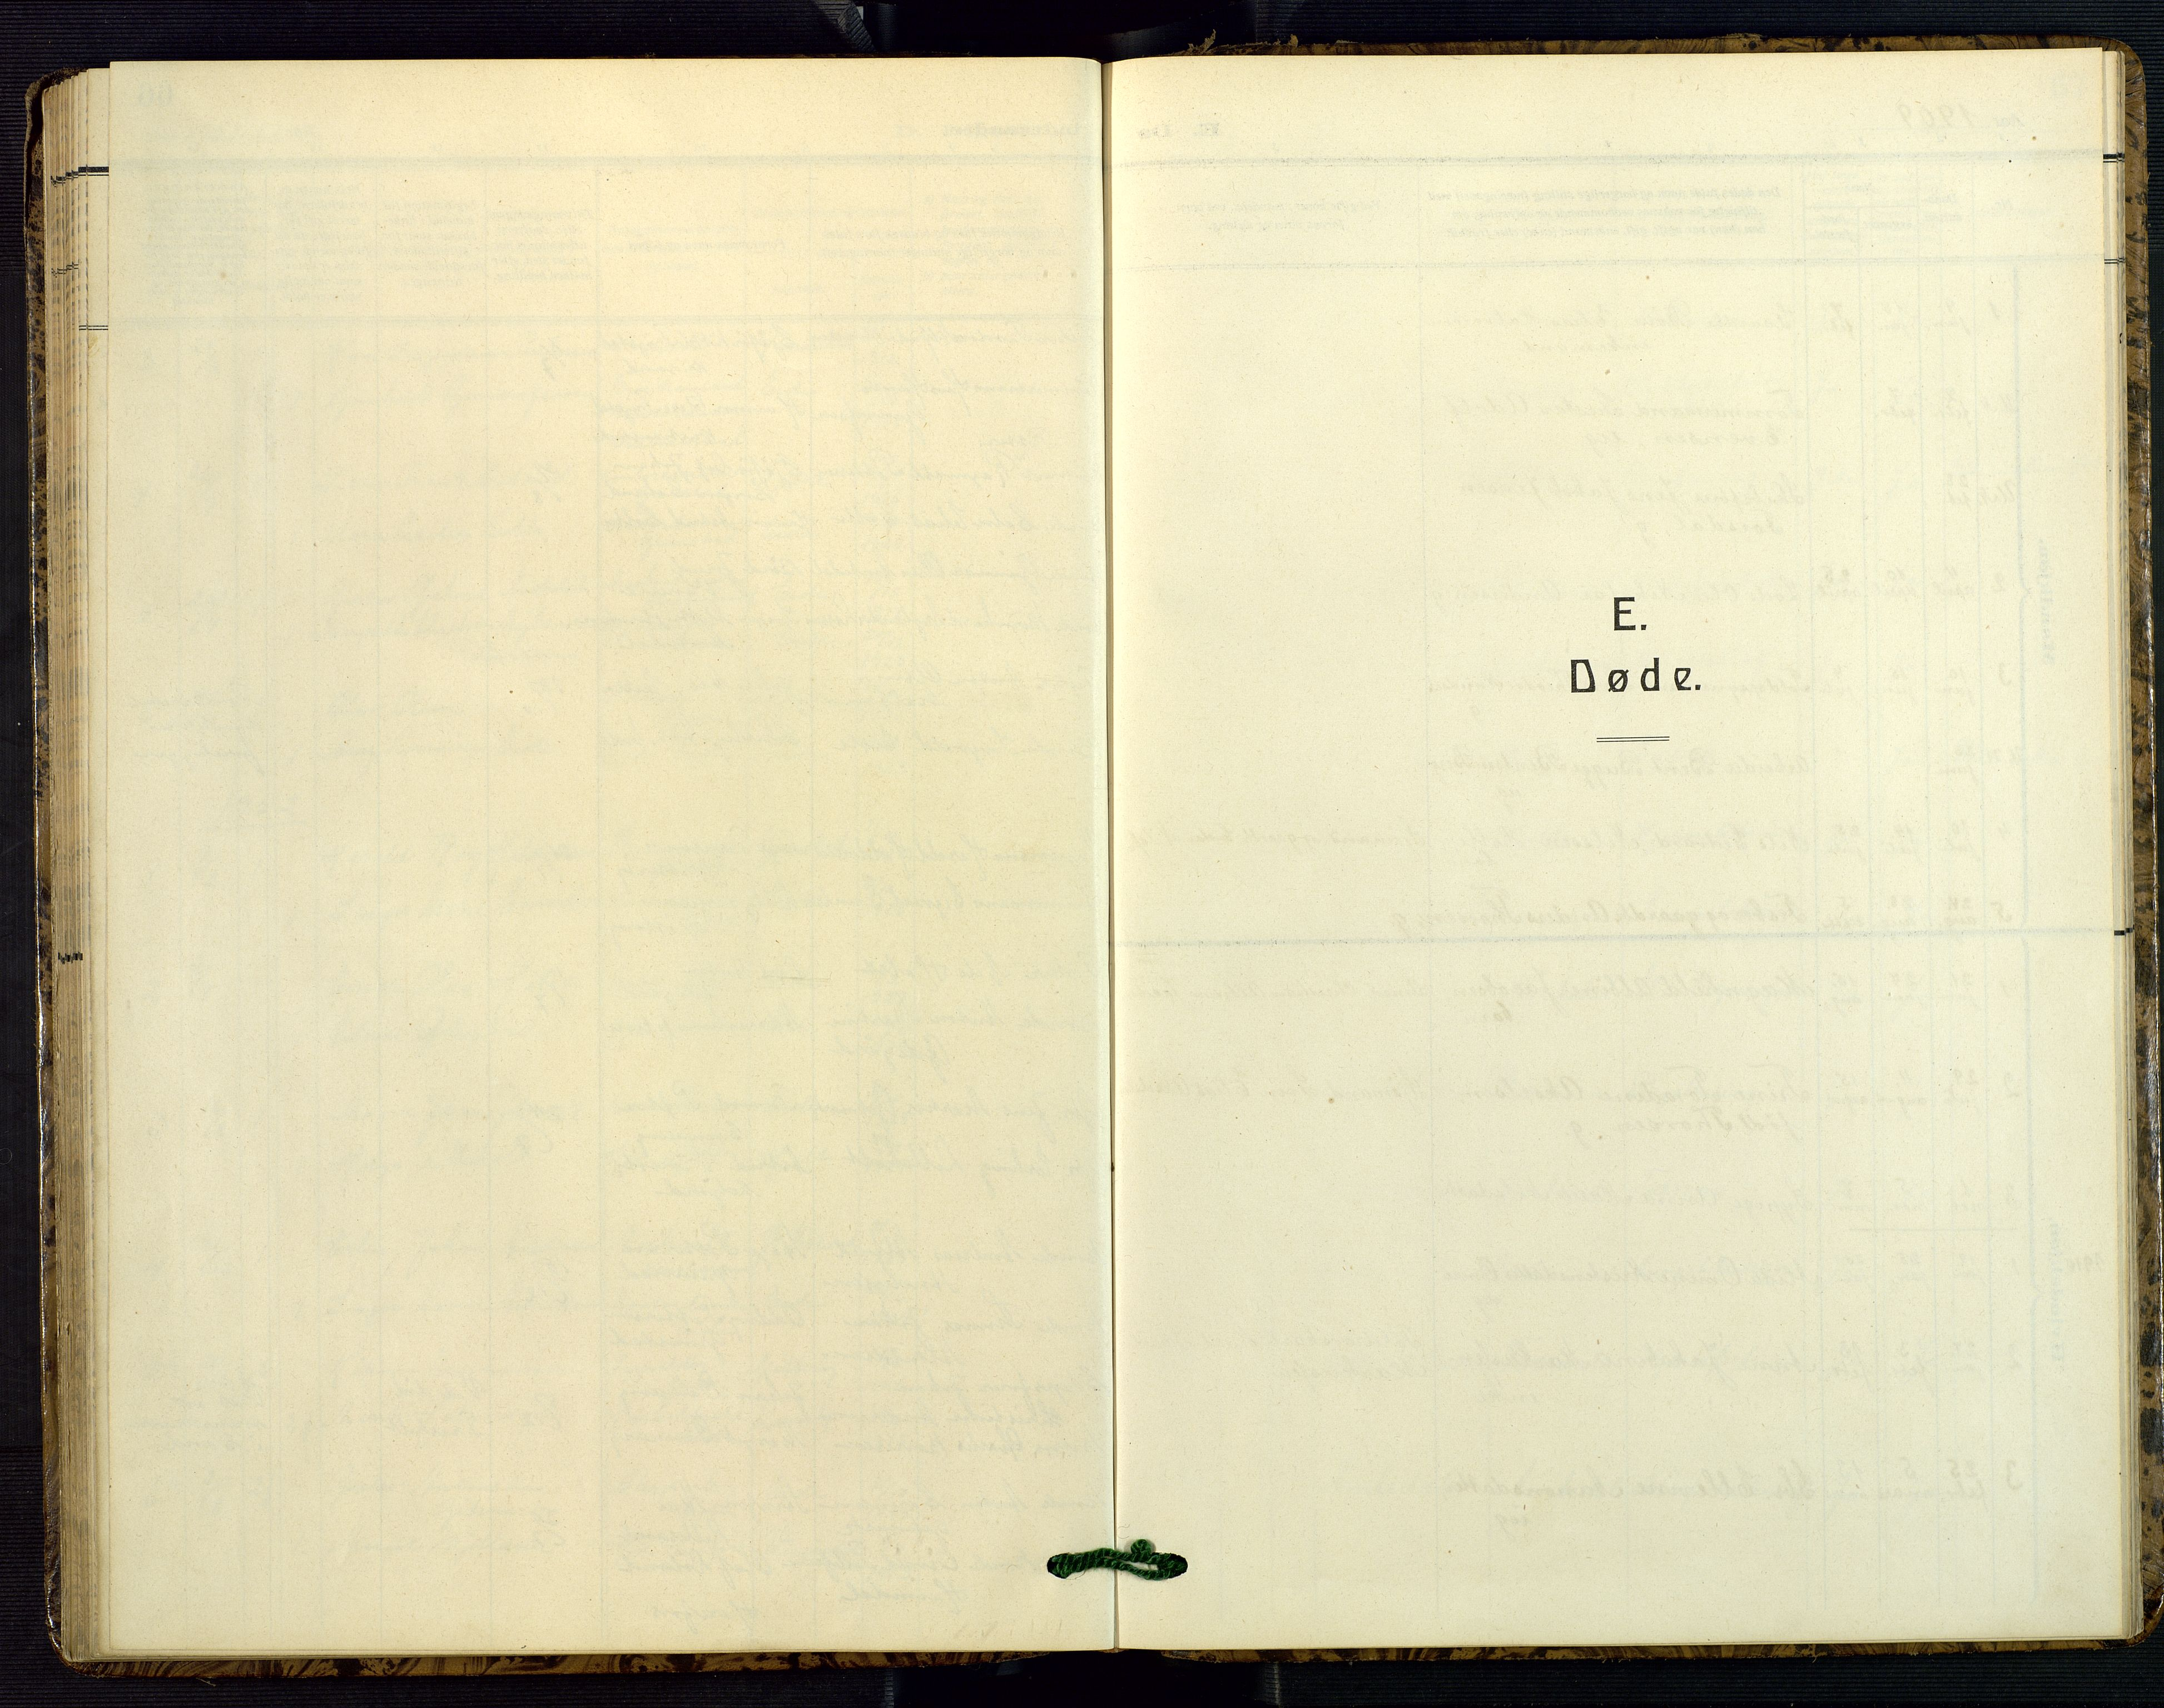 SAK, Hommedal sokneprestkontor, F/Fb/Fba/L0005: Klokkerbok nr. B 5, 1909-1957